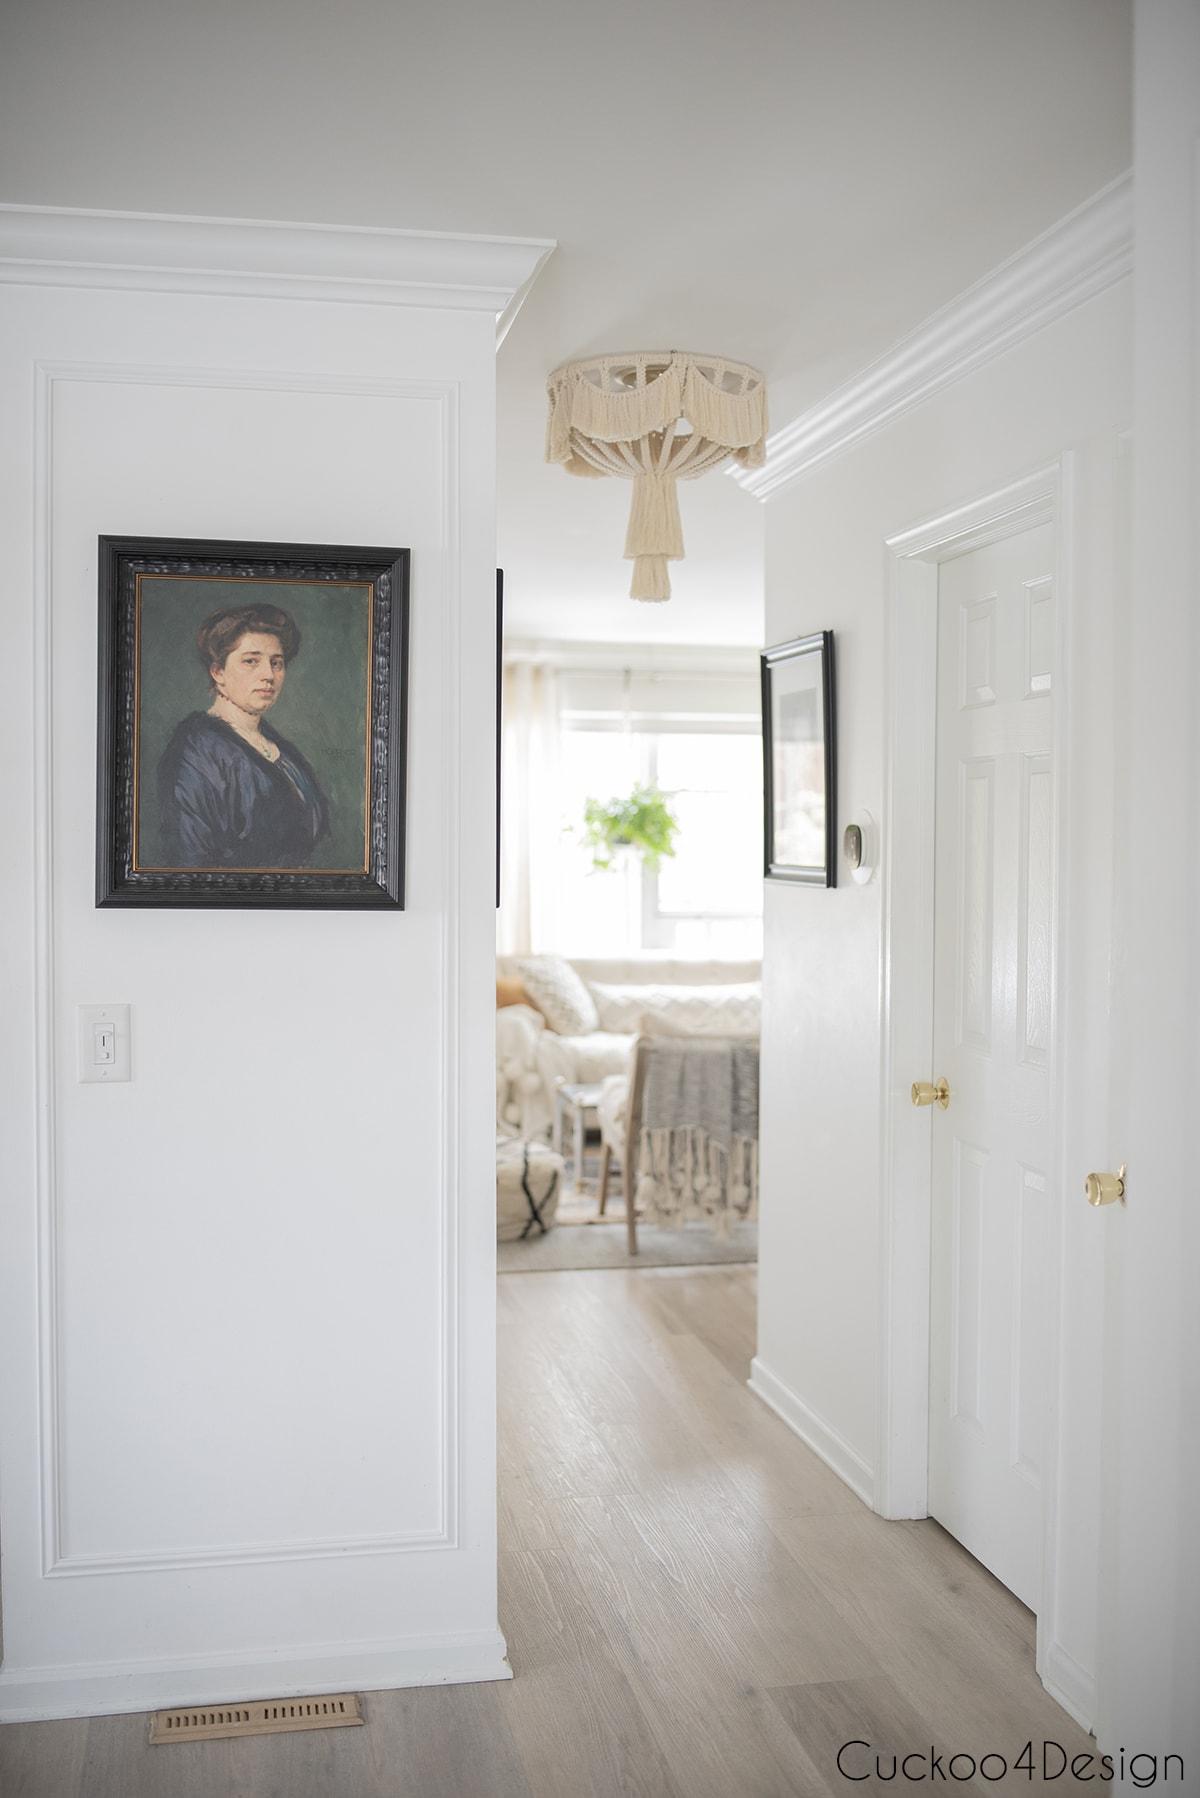 hallway view of flush mount macrame ceiling fixture